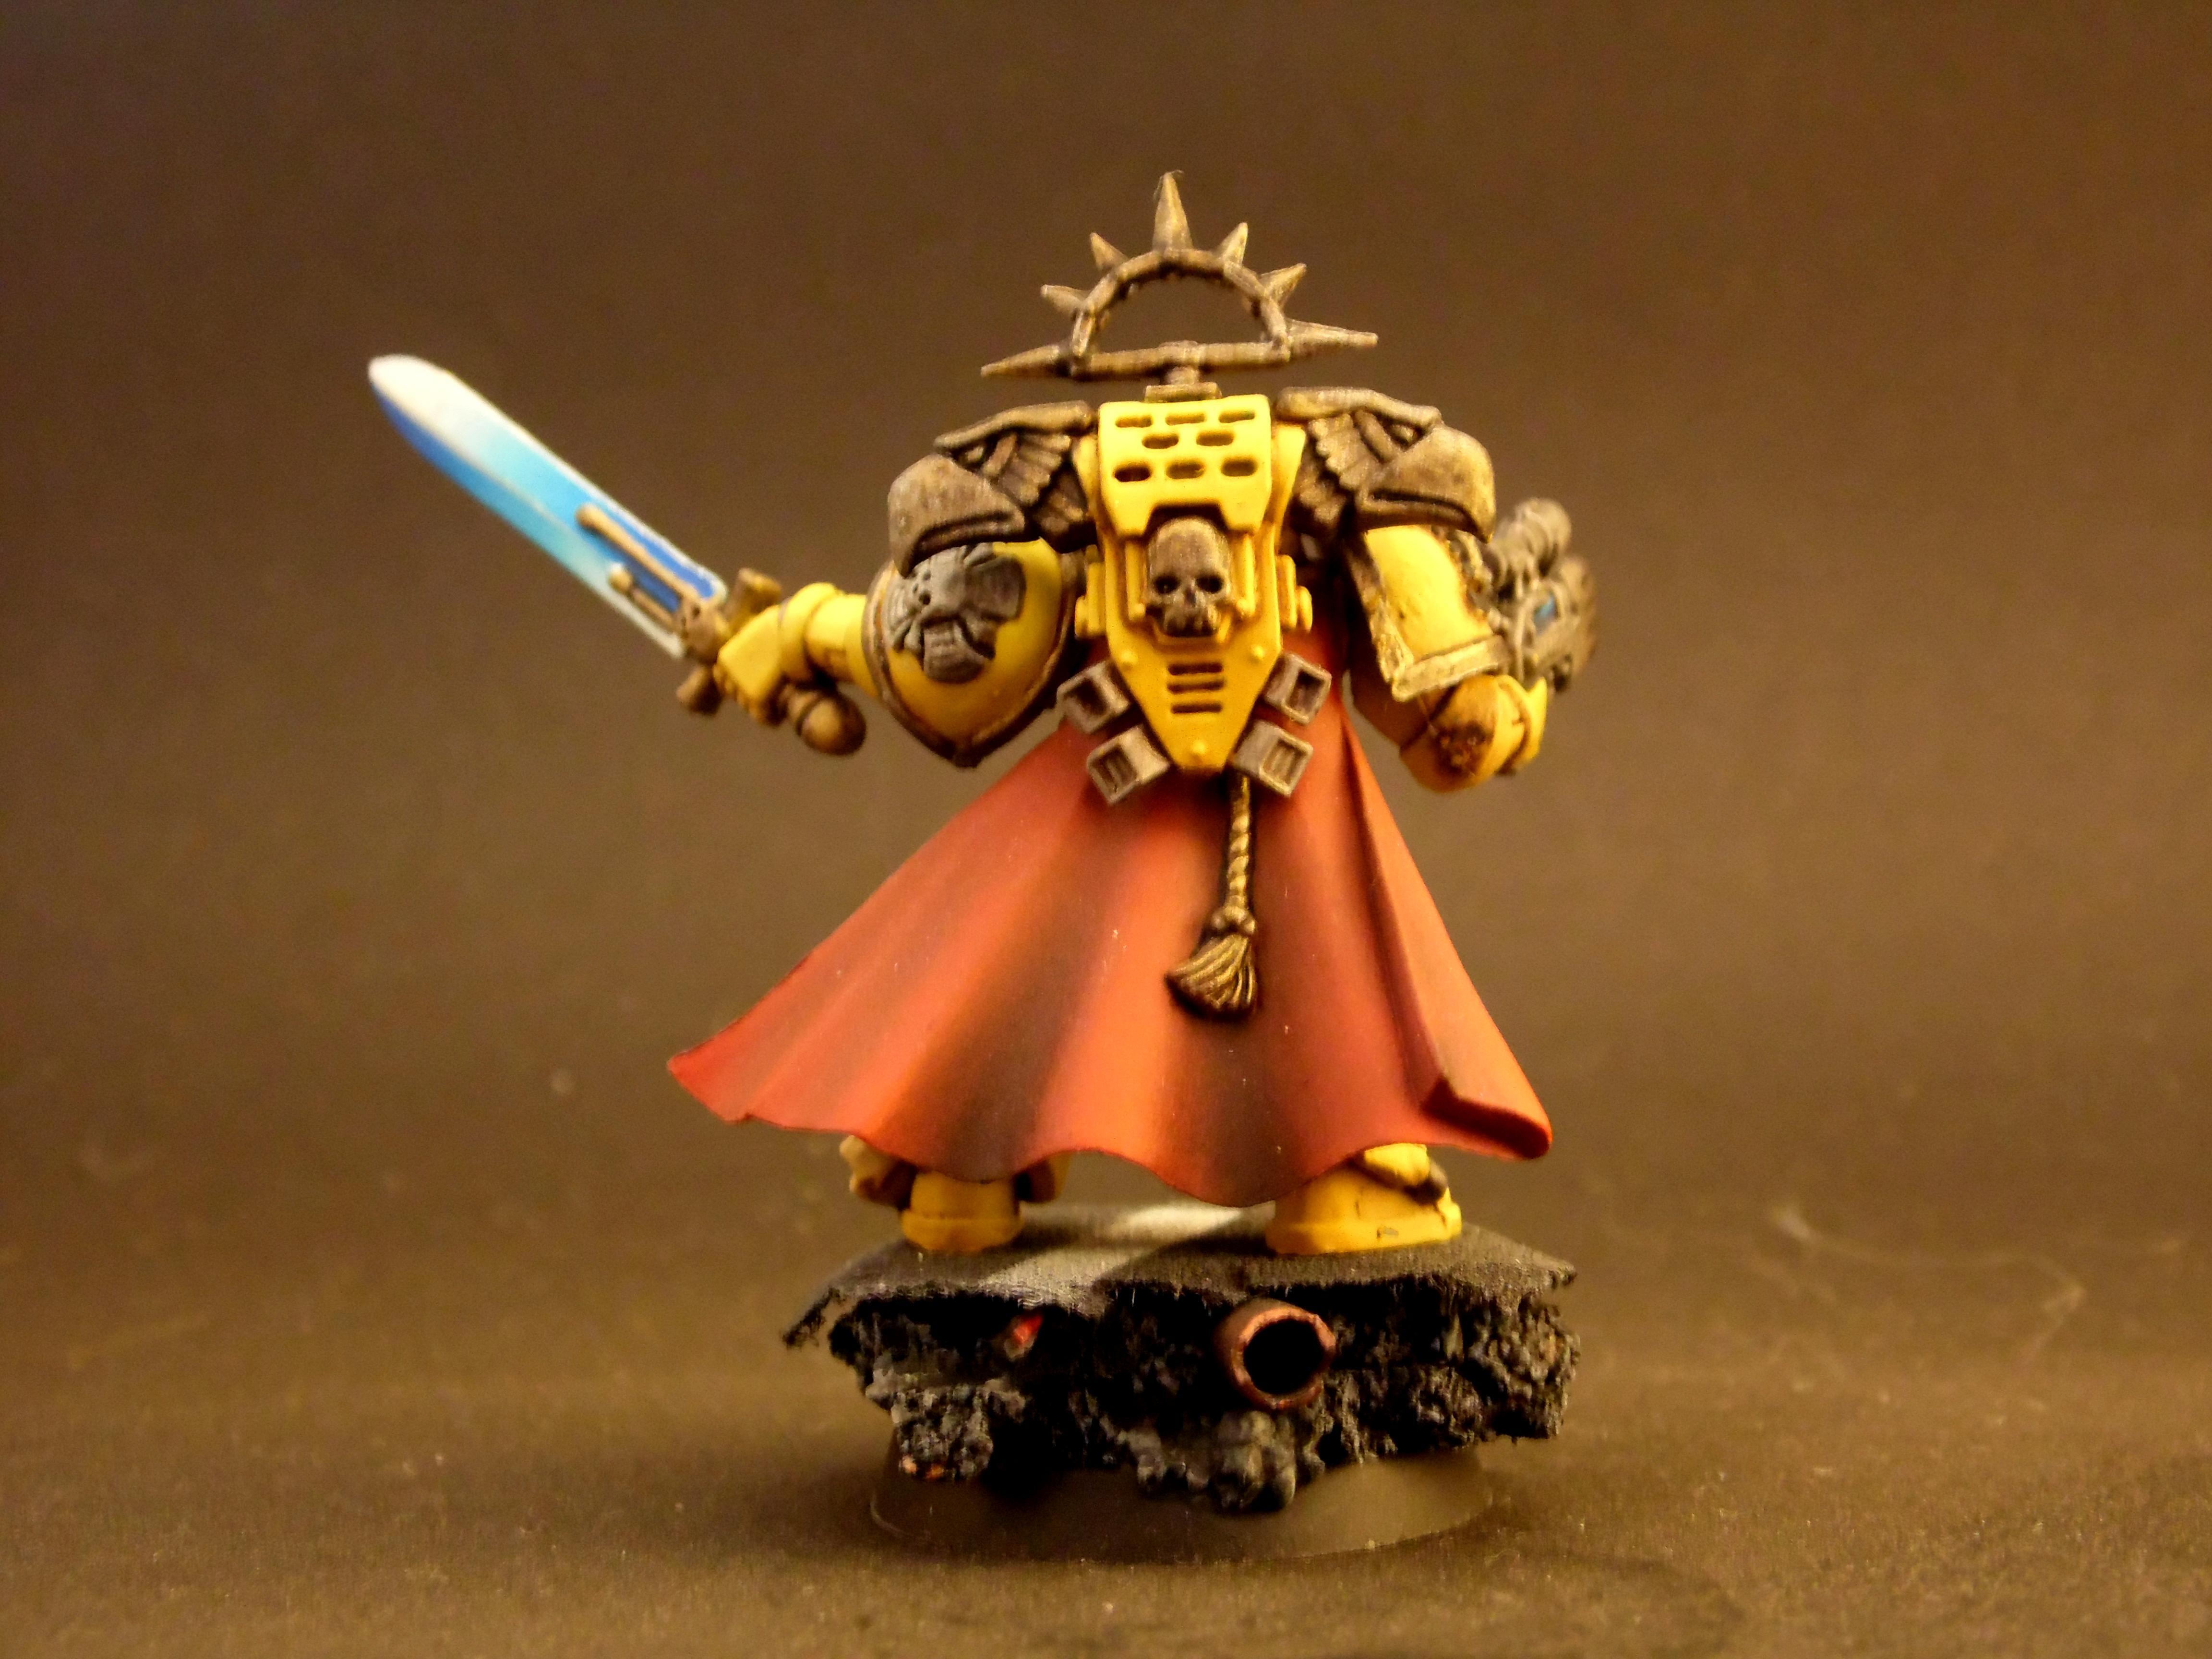 Captain, Commander, Fist, Imperial, Painting, Rustytankpainting, Warhammer 40,000, Warhammer Fantasy